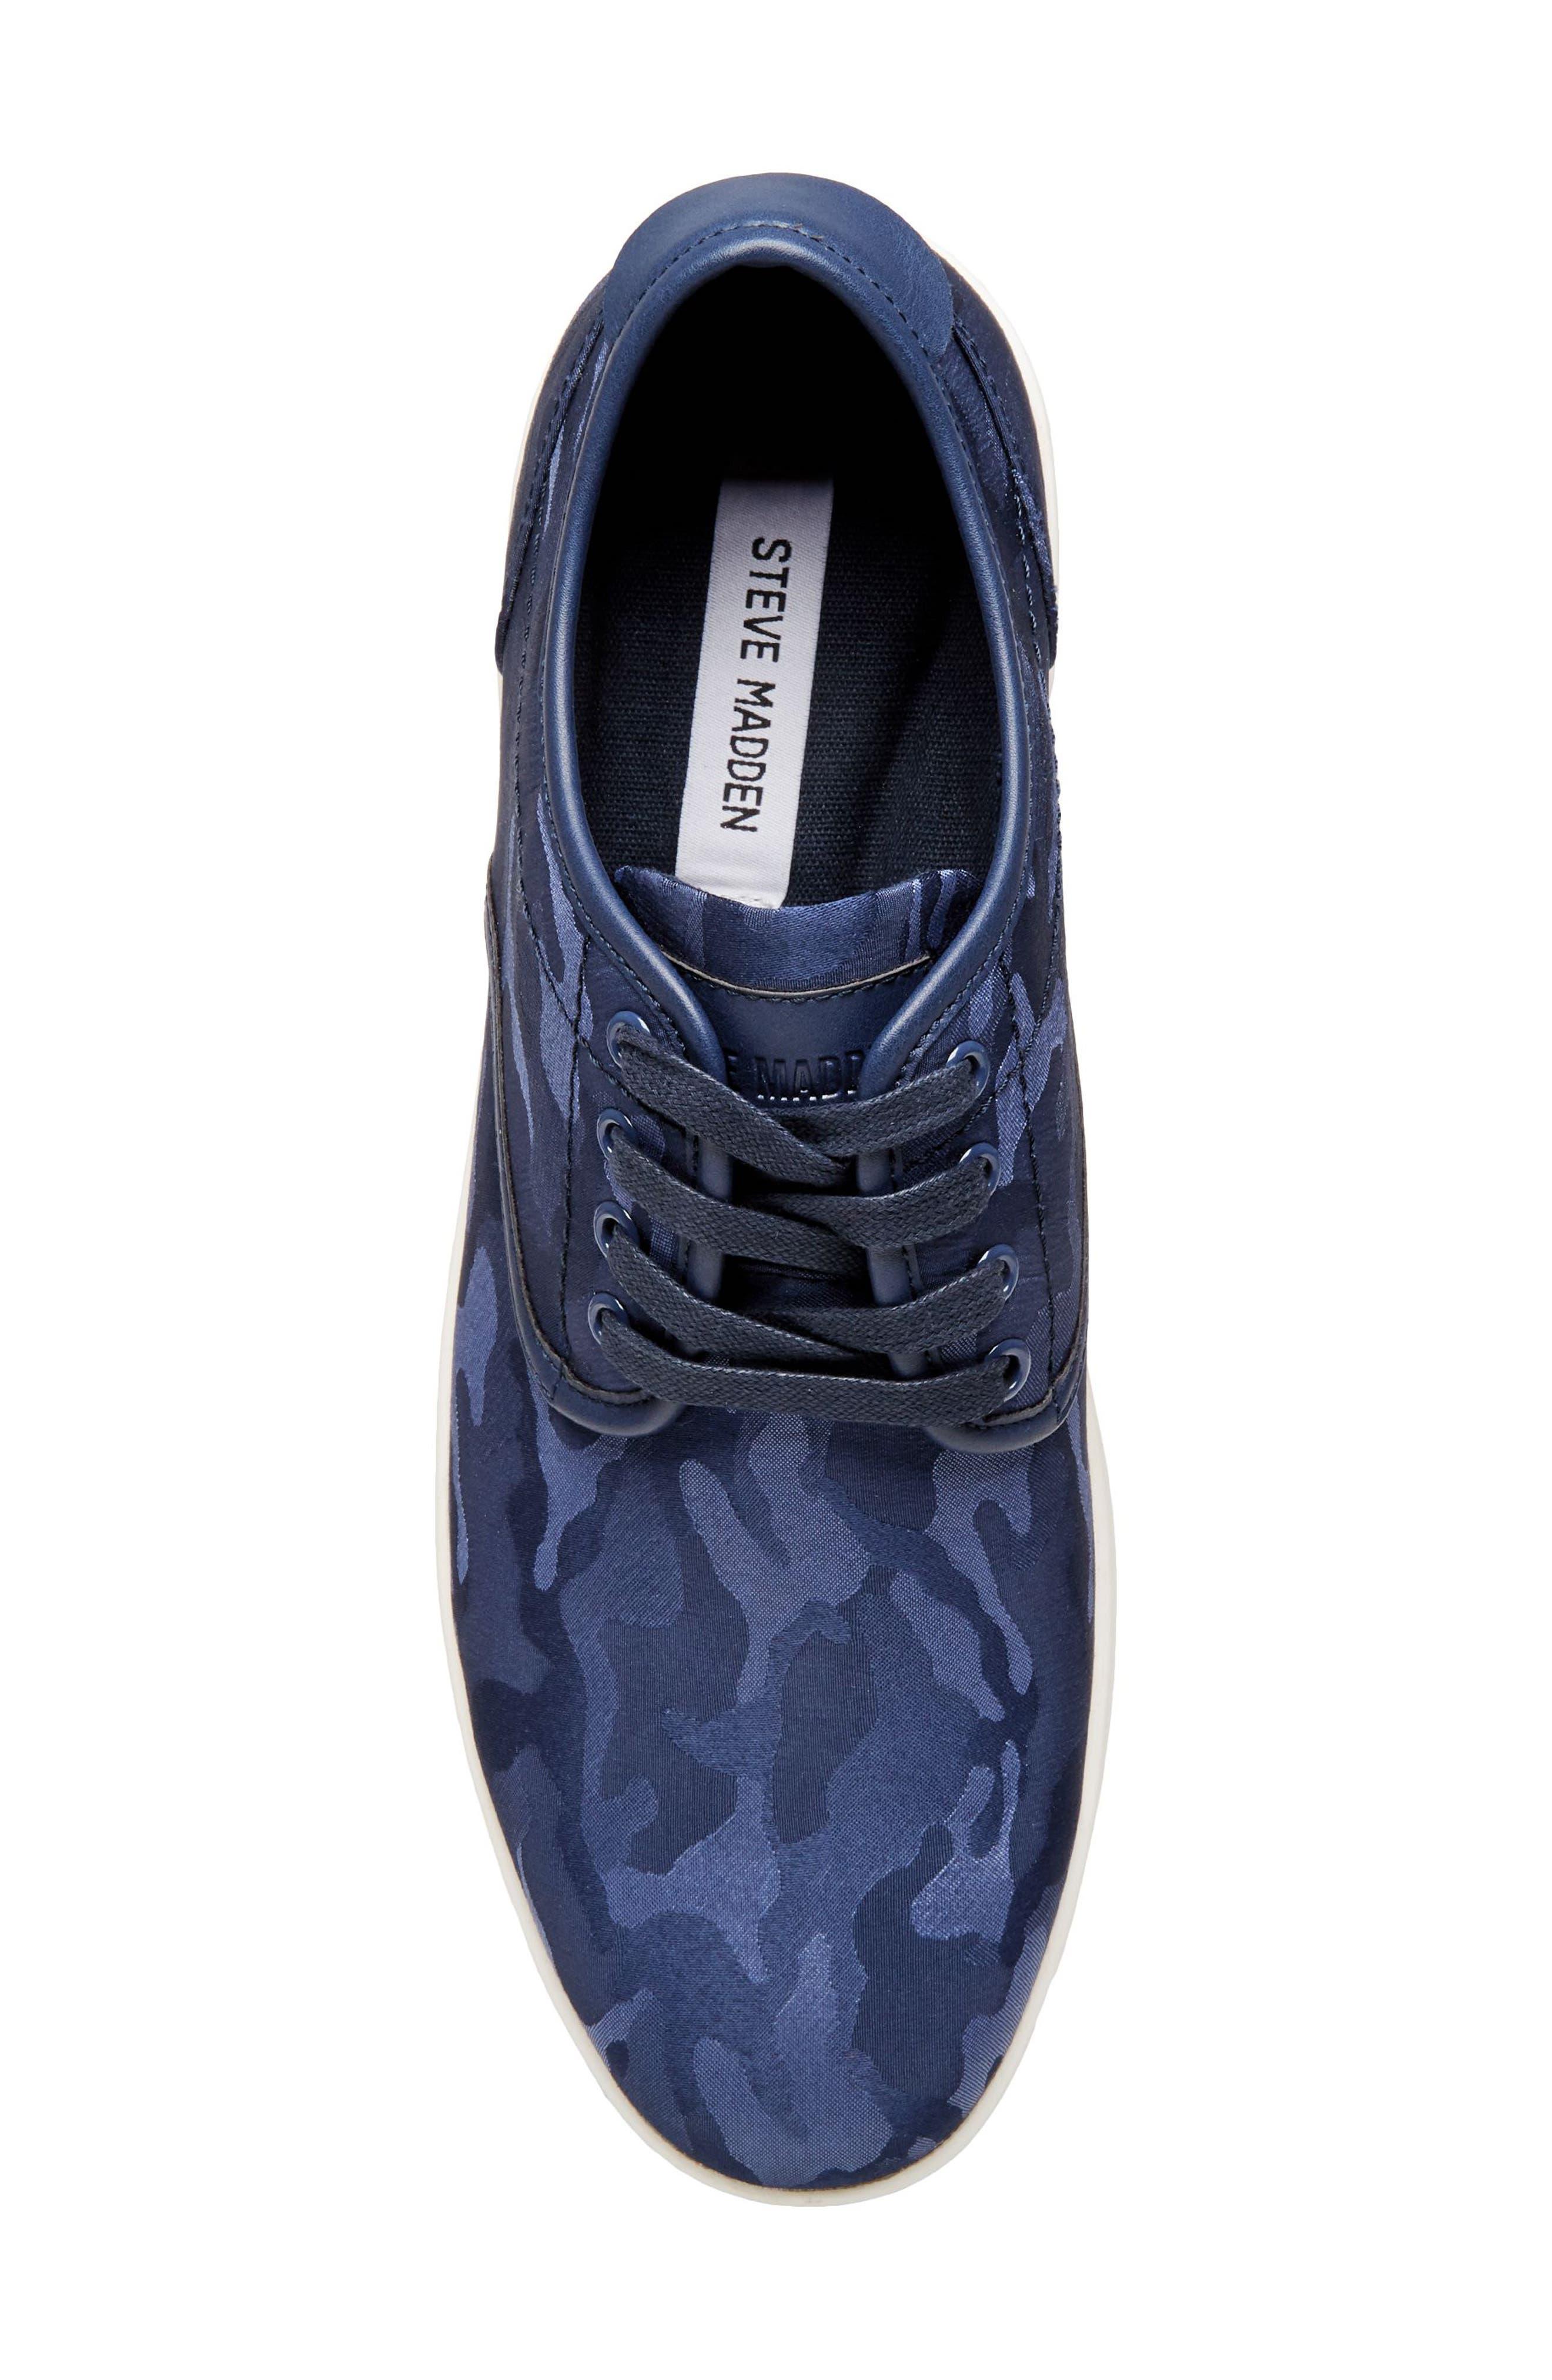 Frenzo Camo Sneaker,                             Alternate thumbnail 6, color,                             Blue Camo Fabric